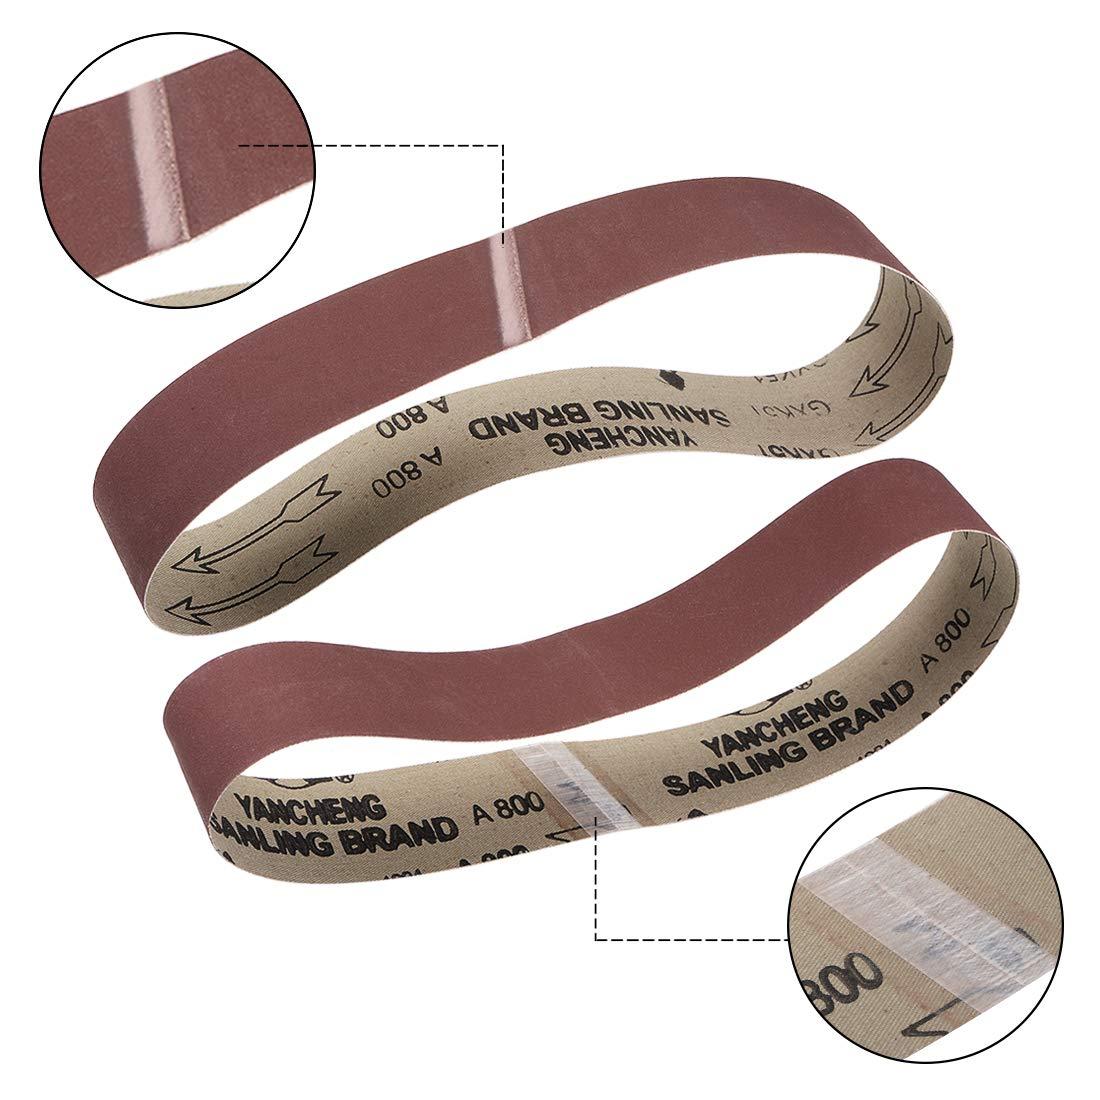 Banda Lijado 400 Granos /Óxido Aluminio 4pcs sourcing map 2 Pulgadas x 27 Pulgadas 50mm x 686mm